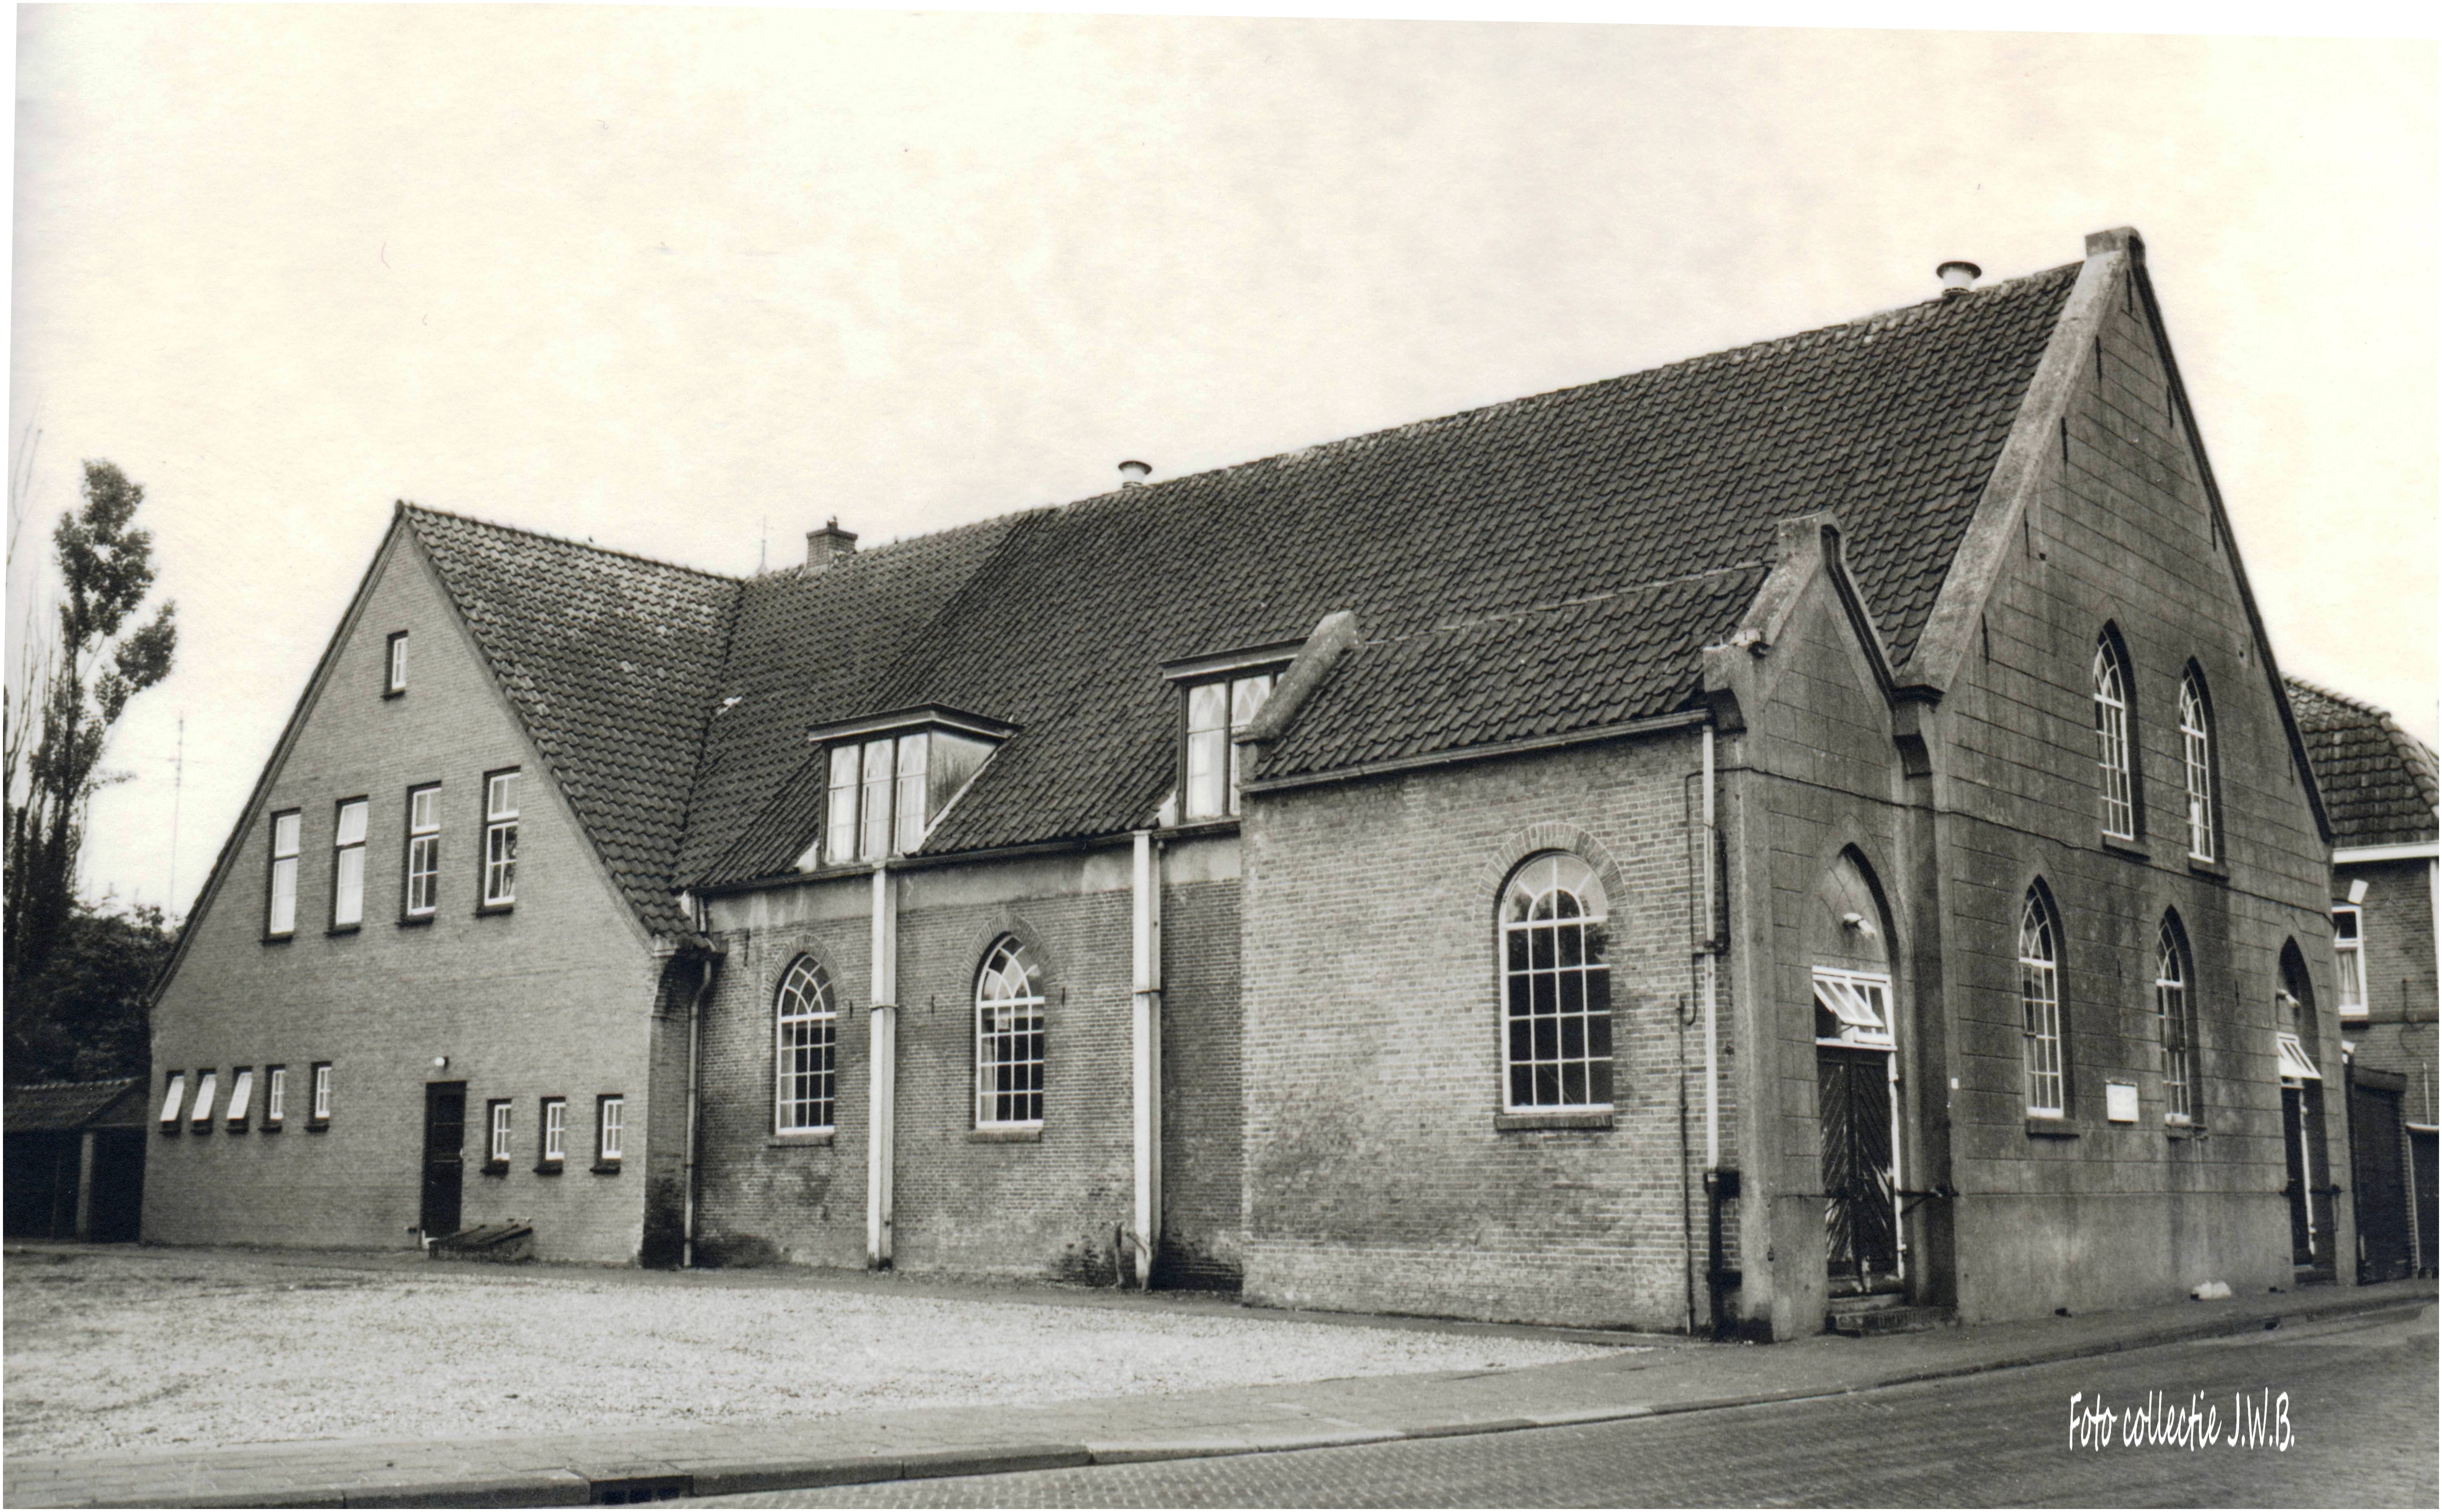 dalfsen geref kerk 1968 2